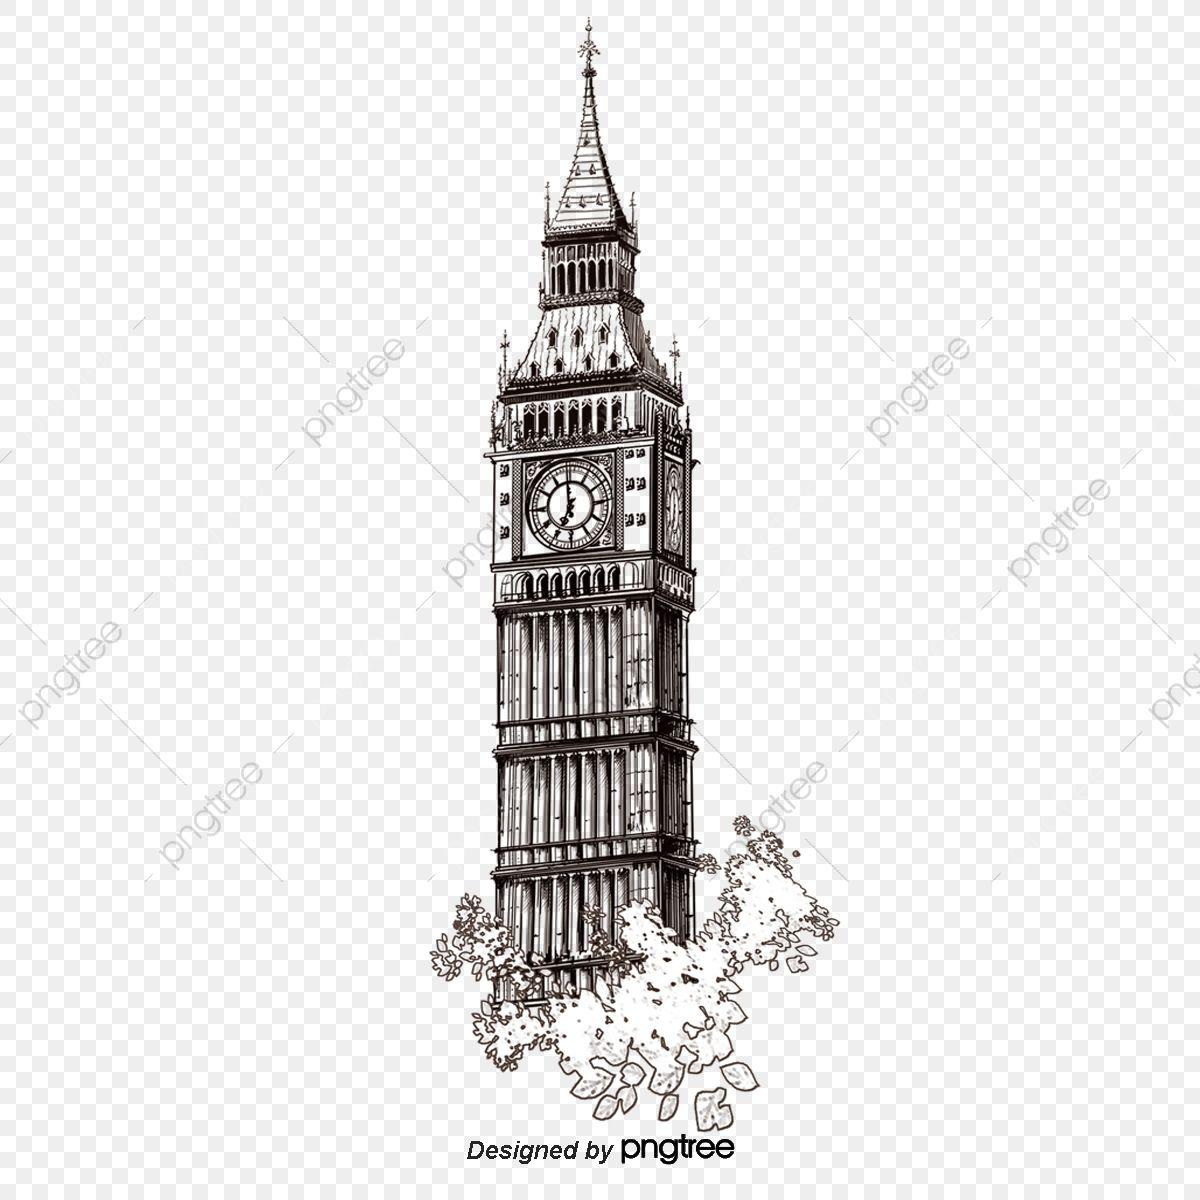 British Landmark London Big Ben Silhouette Big Ben Architecture Png Transparent Clipart Image And Psd File For Free Download Big Ben London Big Ben London Landmarks